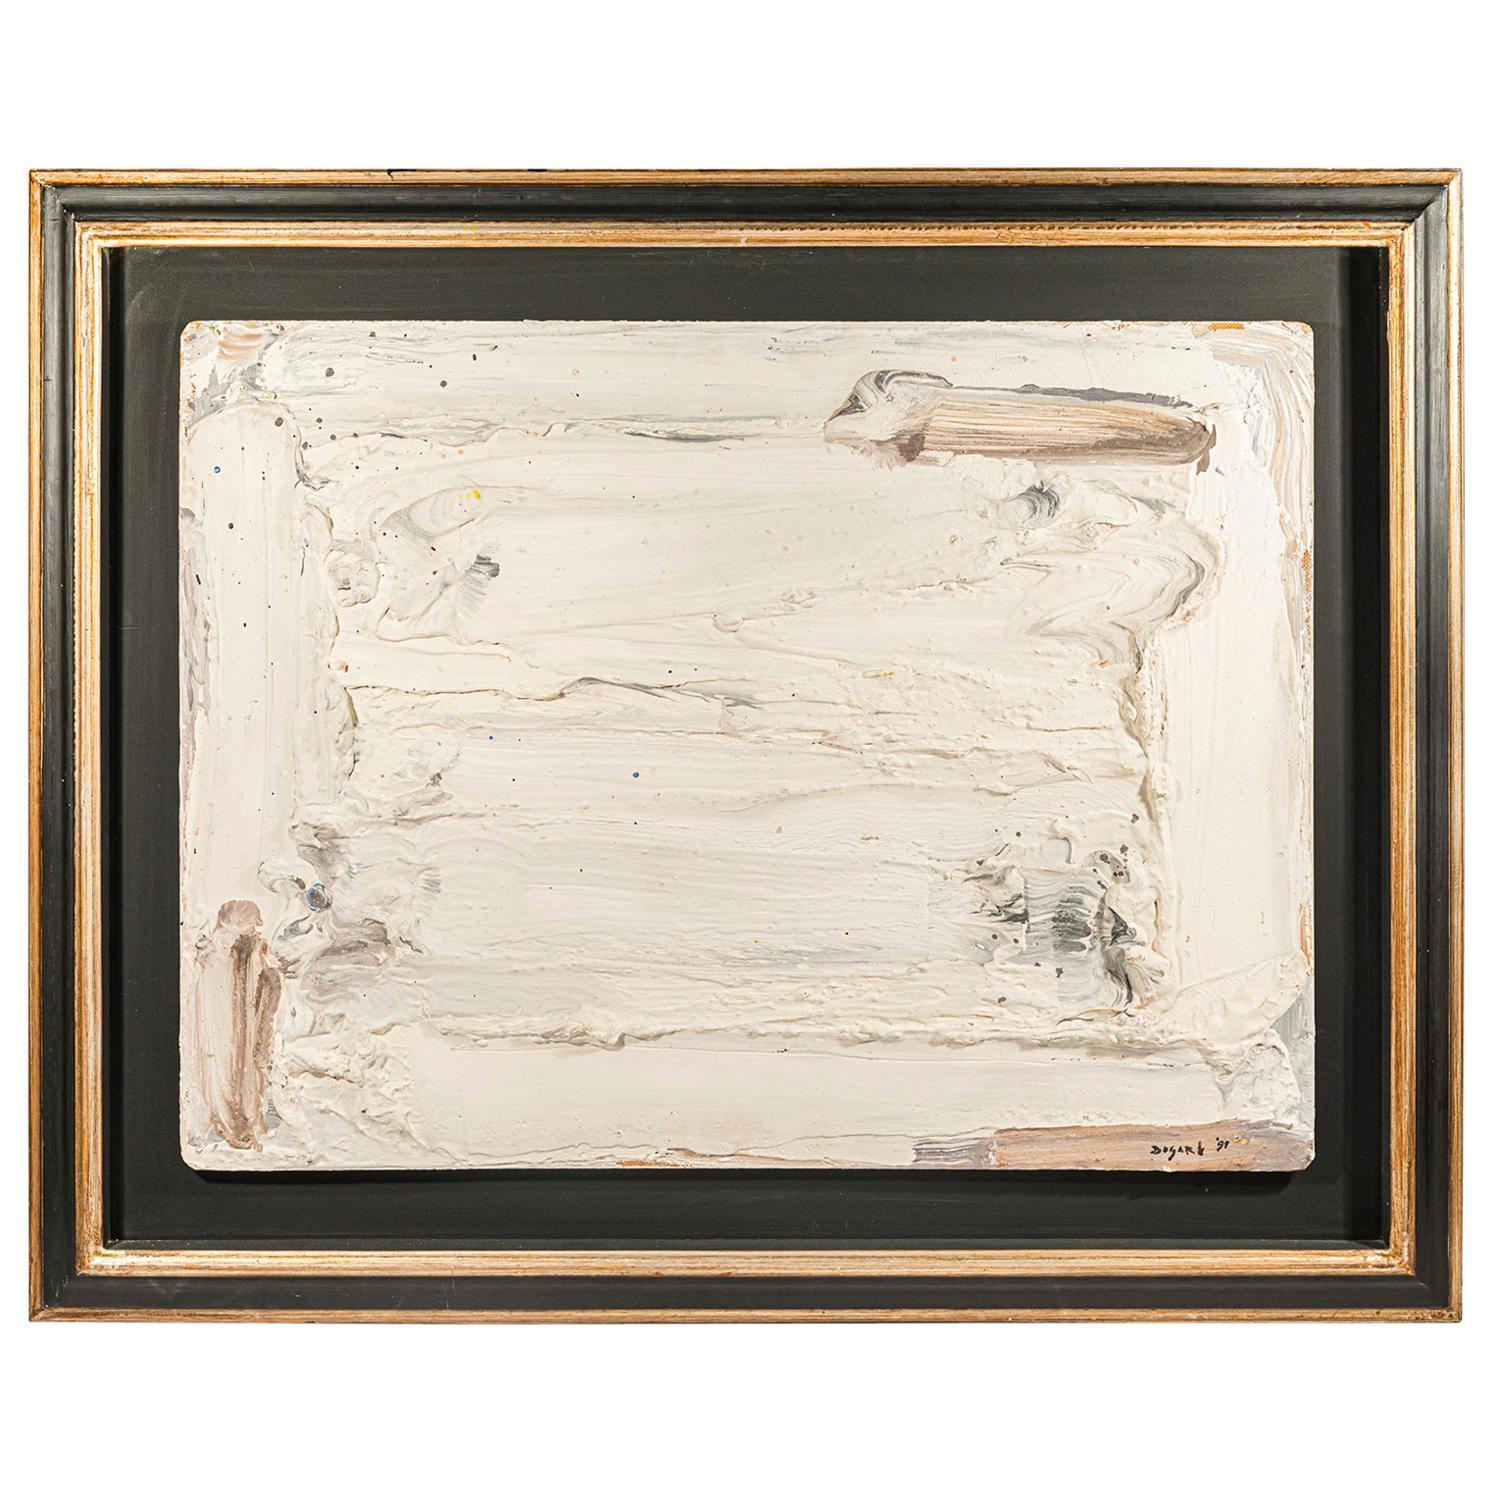 Bram Bogart (1921-2012), Painting, Signed, Belgium, 1991